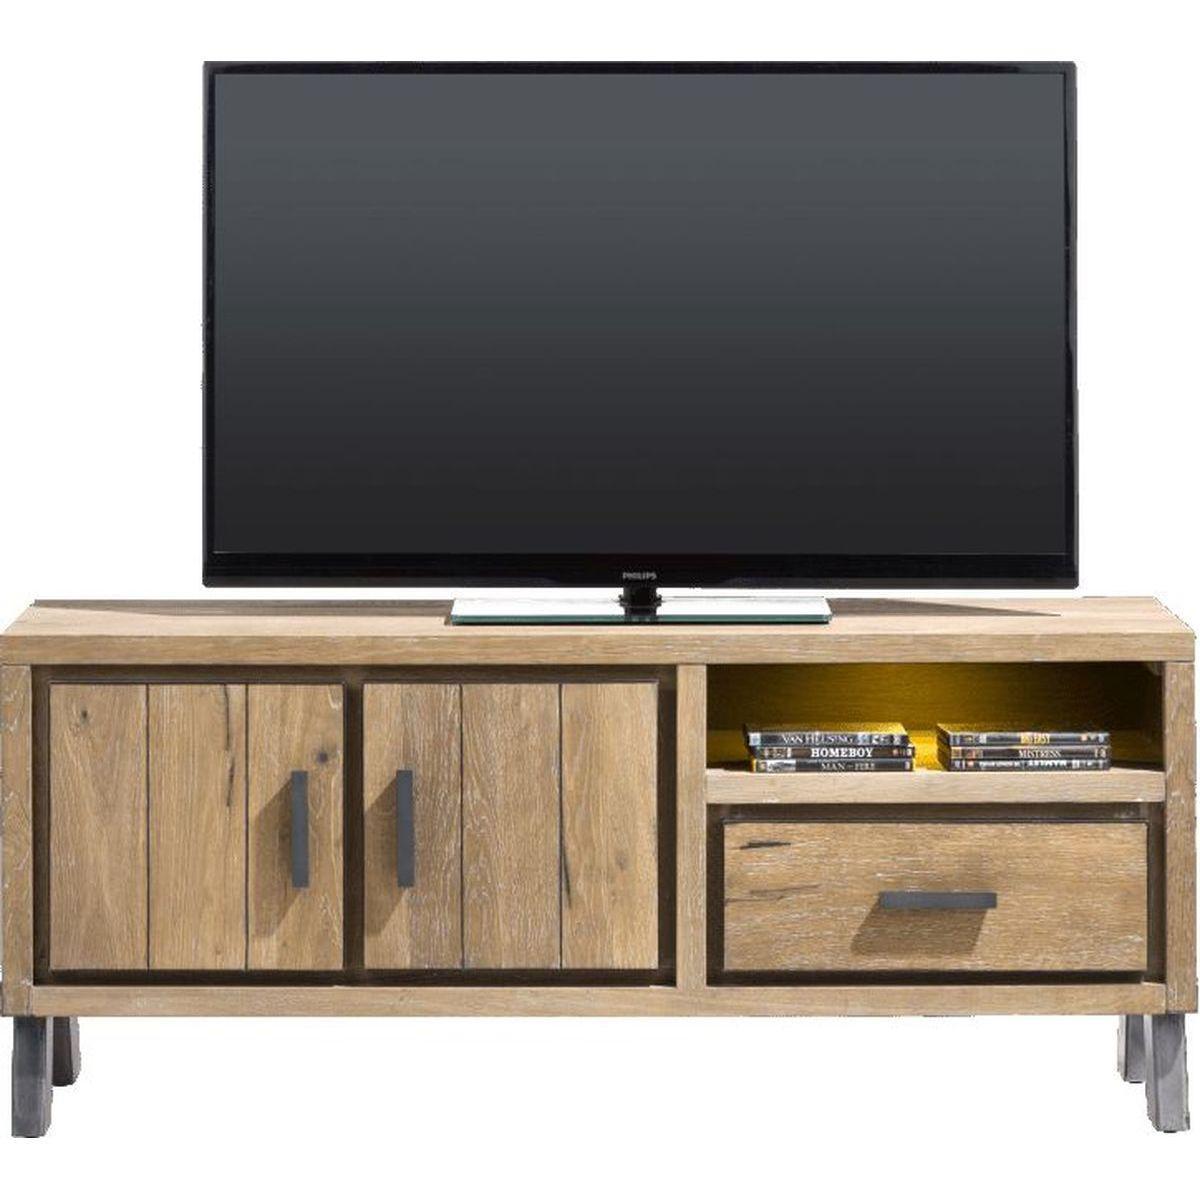 Meuble TV VITORIA HetH 140cm LED